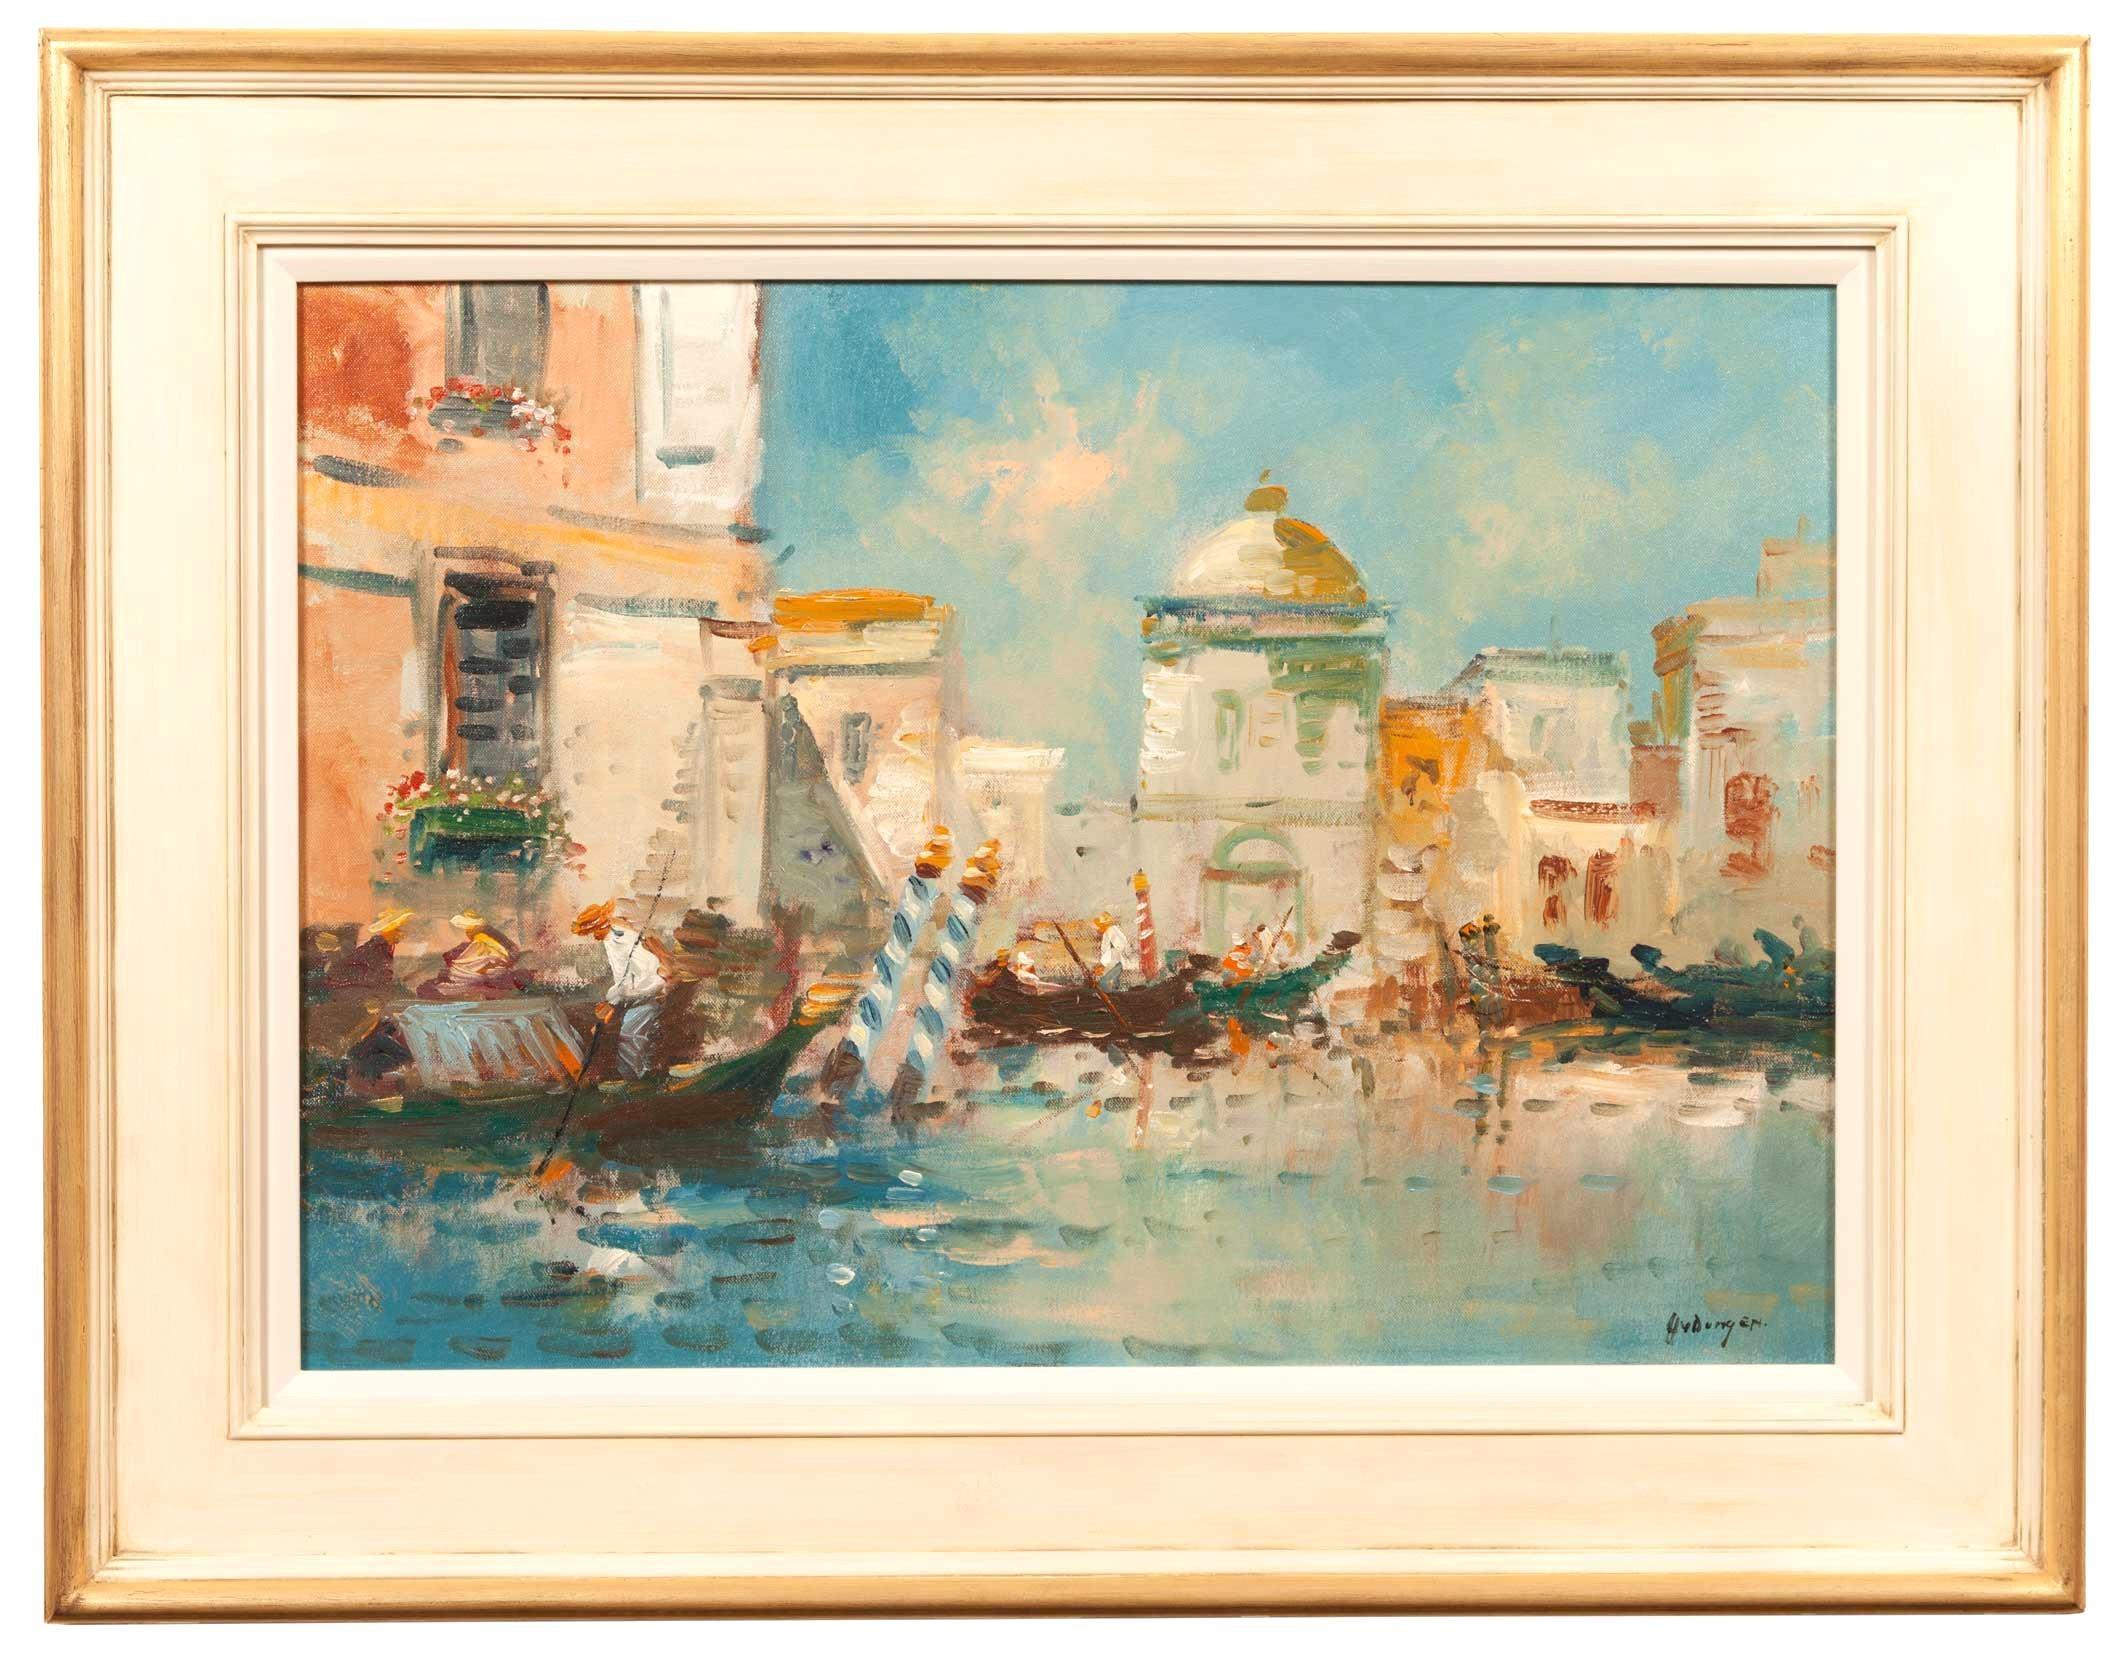 Venetian Oil Painting by Harrjj Van Dongen